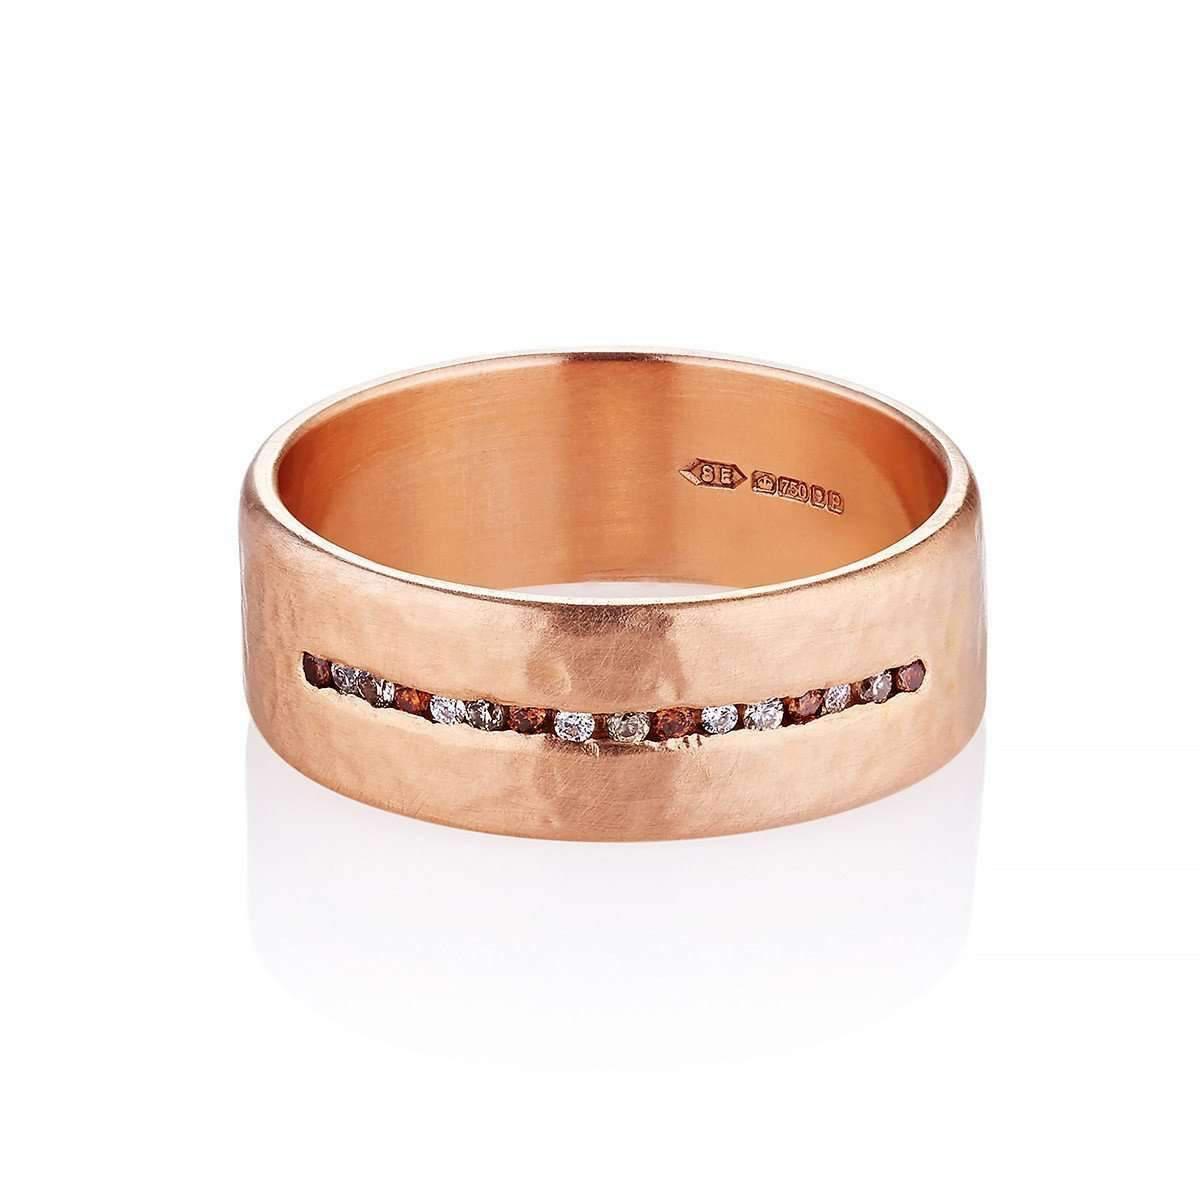 Shakti Ellenwood 18kt Fairtrade Celine Diamond Ring Jez9IybmfH